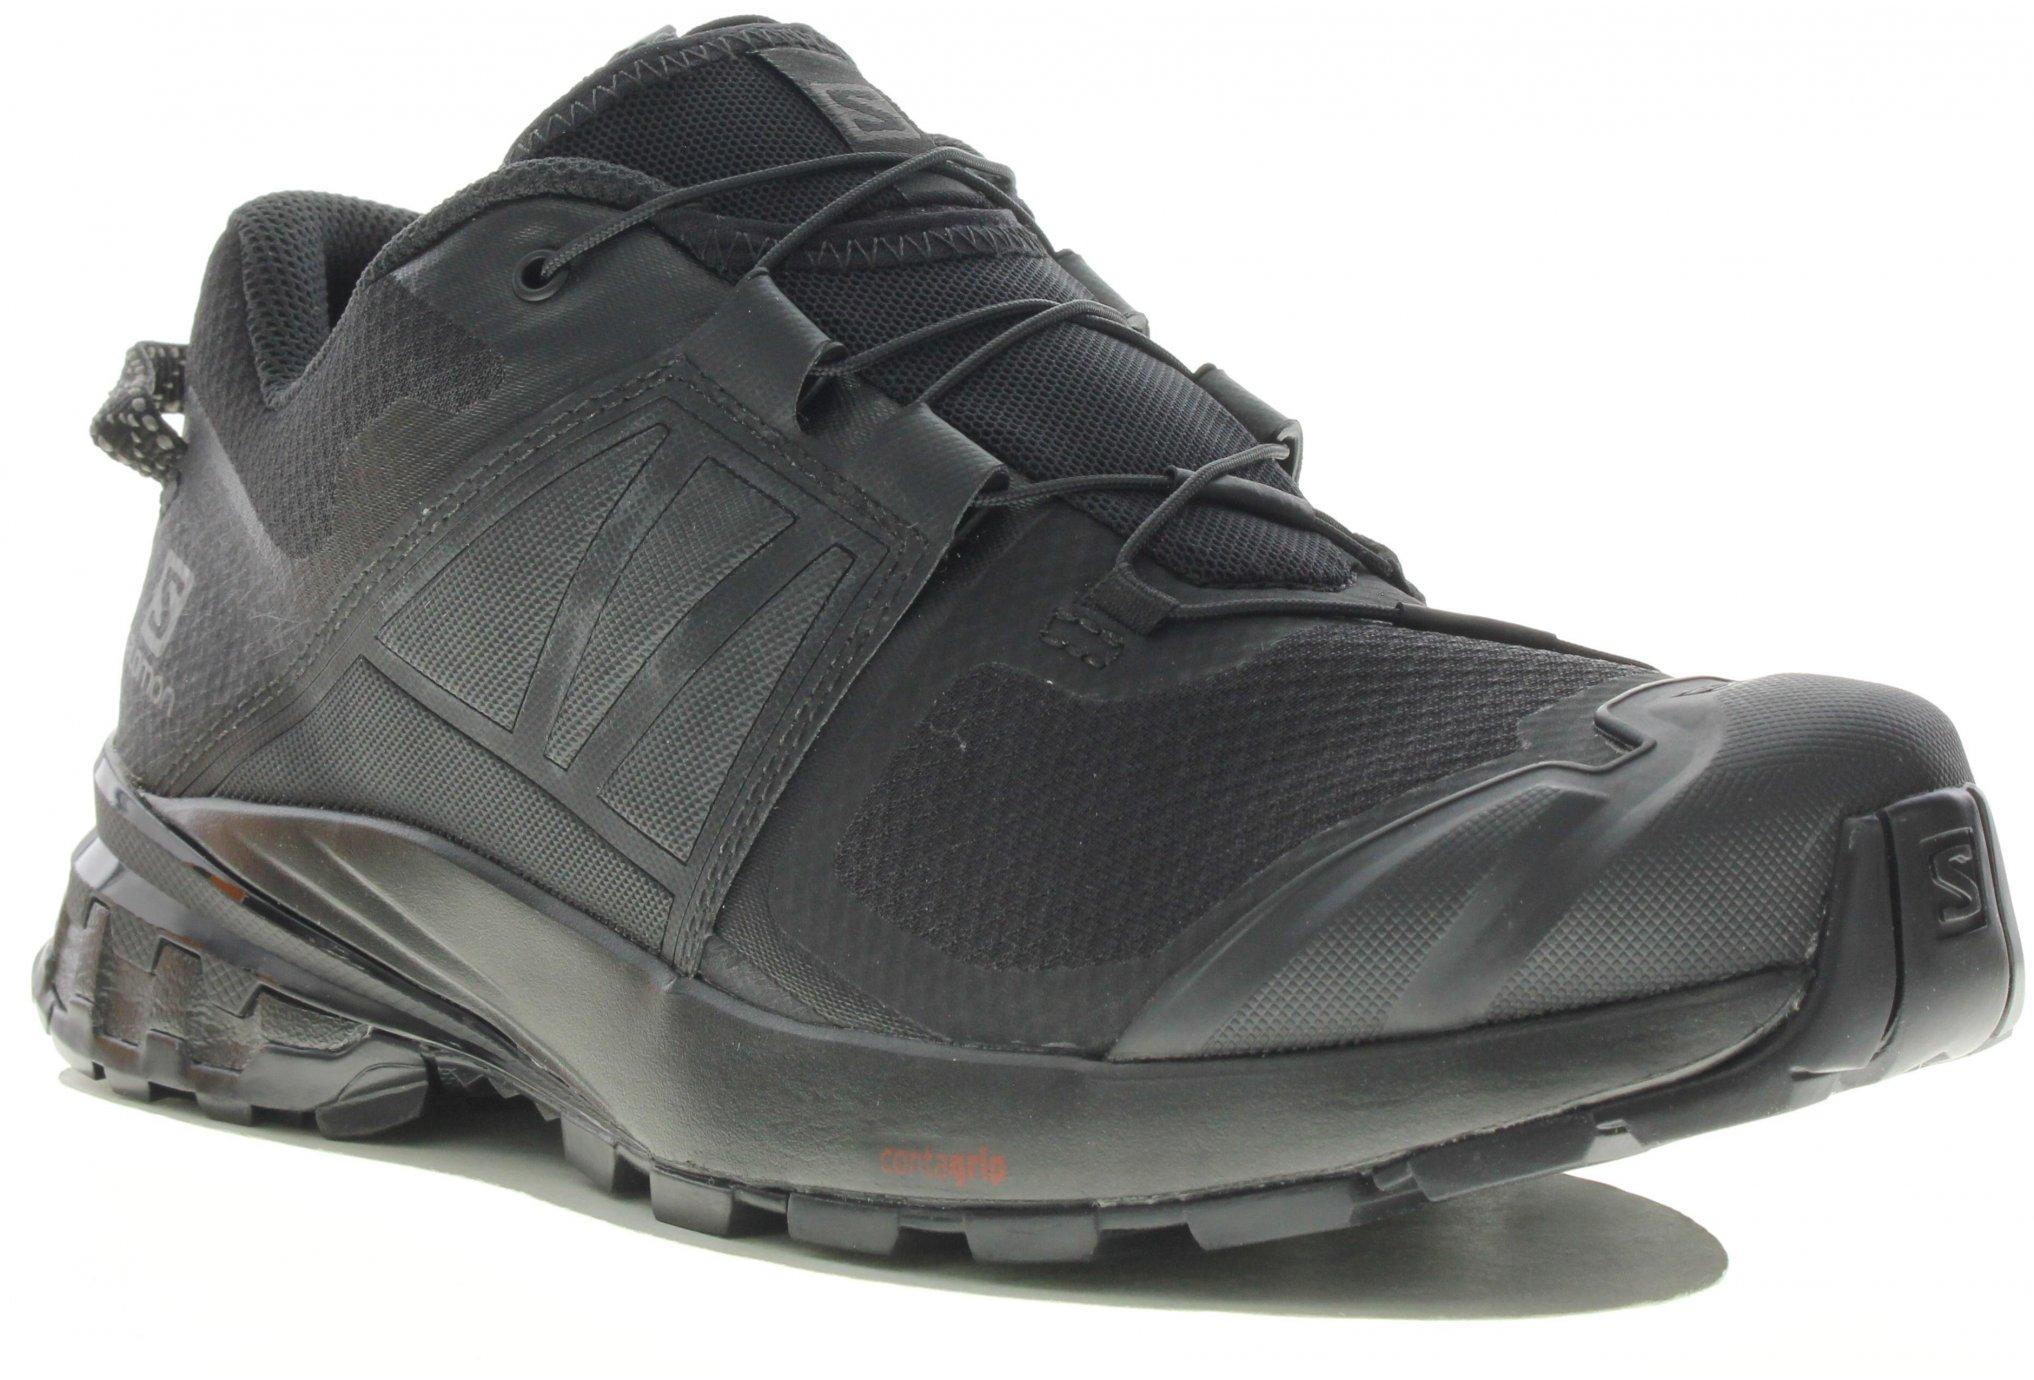 Salomon XA Wild Chaussures running femme